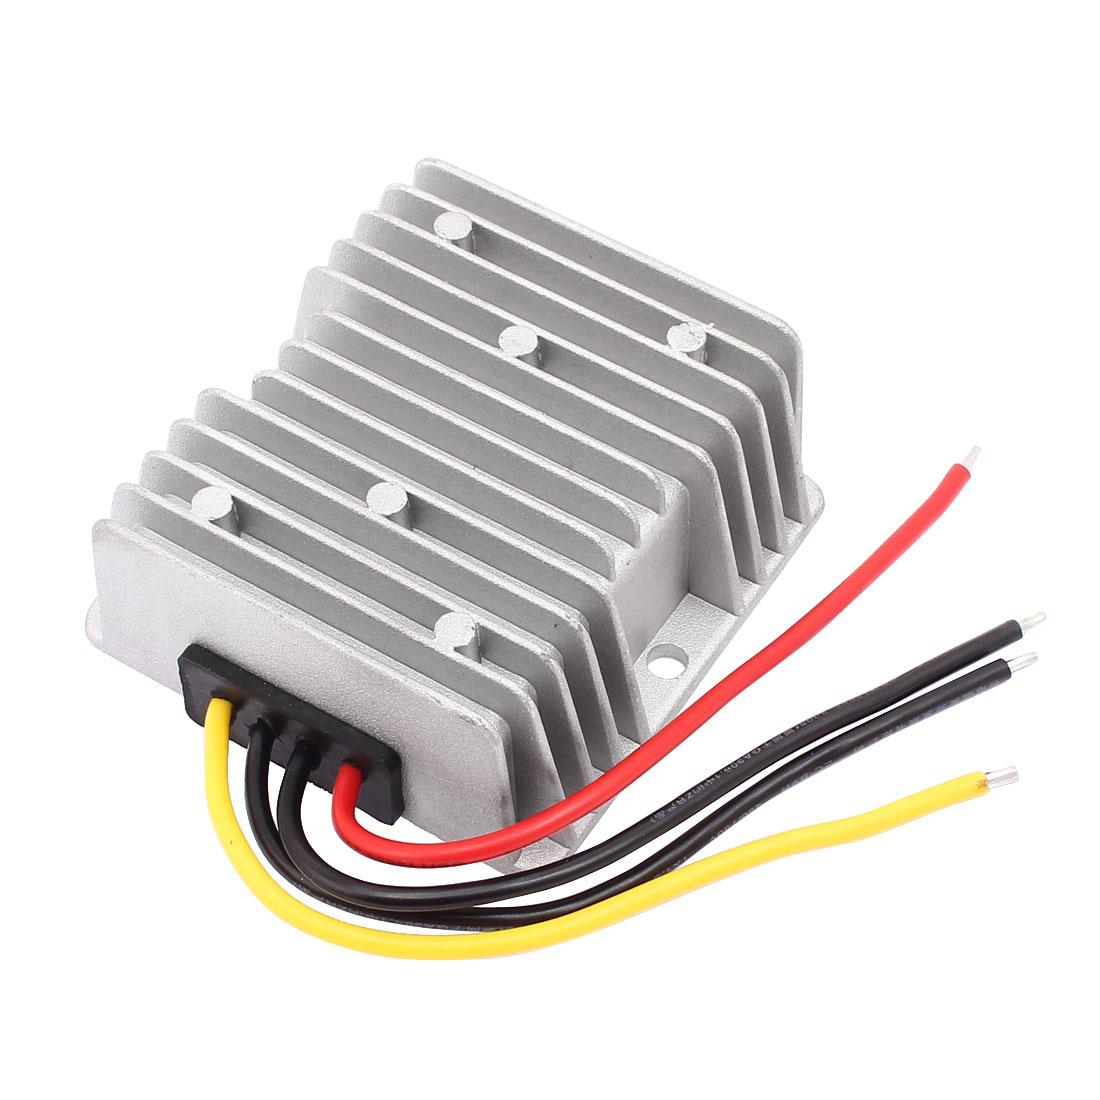 DC12V(6V-20V) to DC12V 12A 144W Booster Waterproof Car Power Converter Regulator Transformer